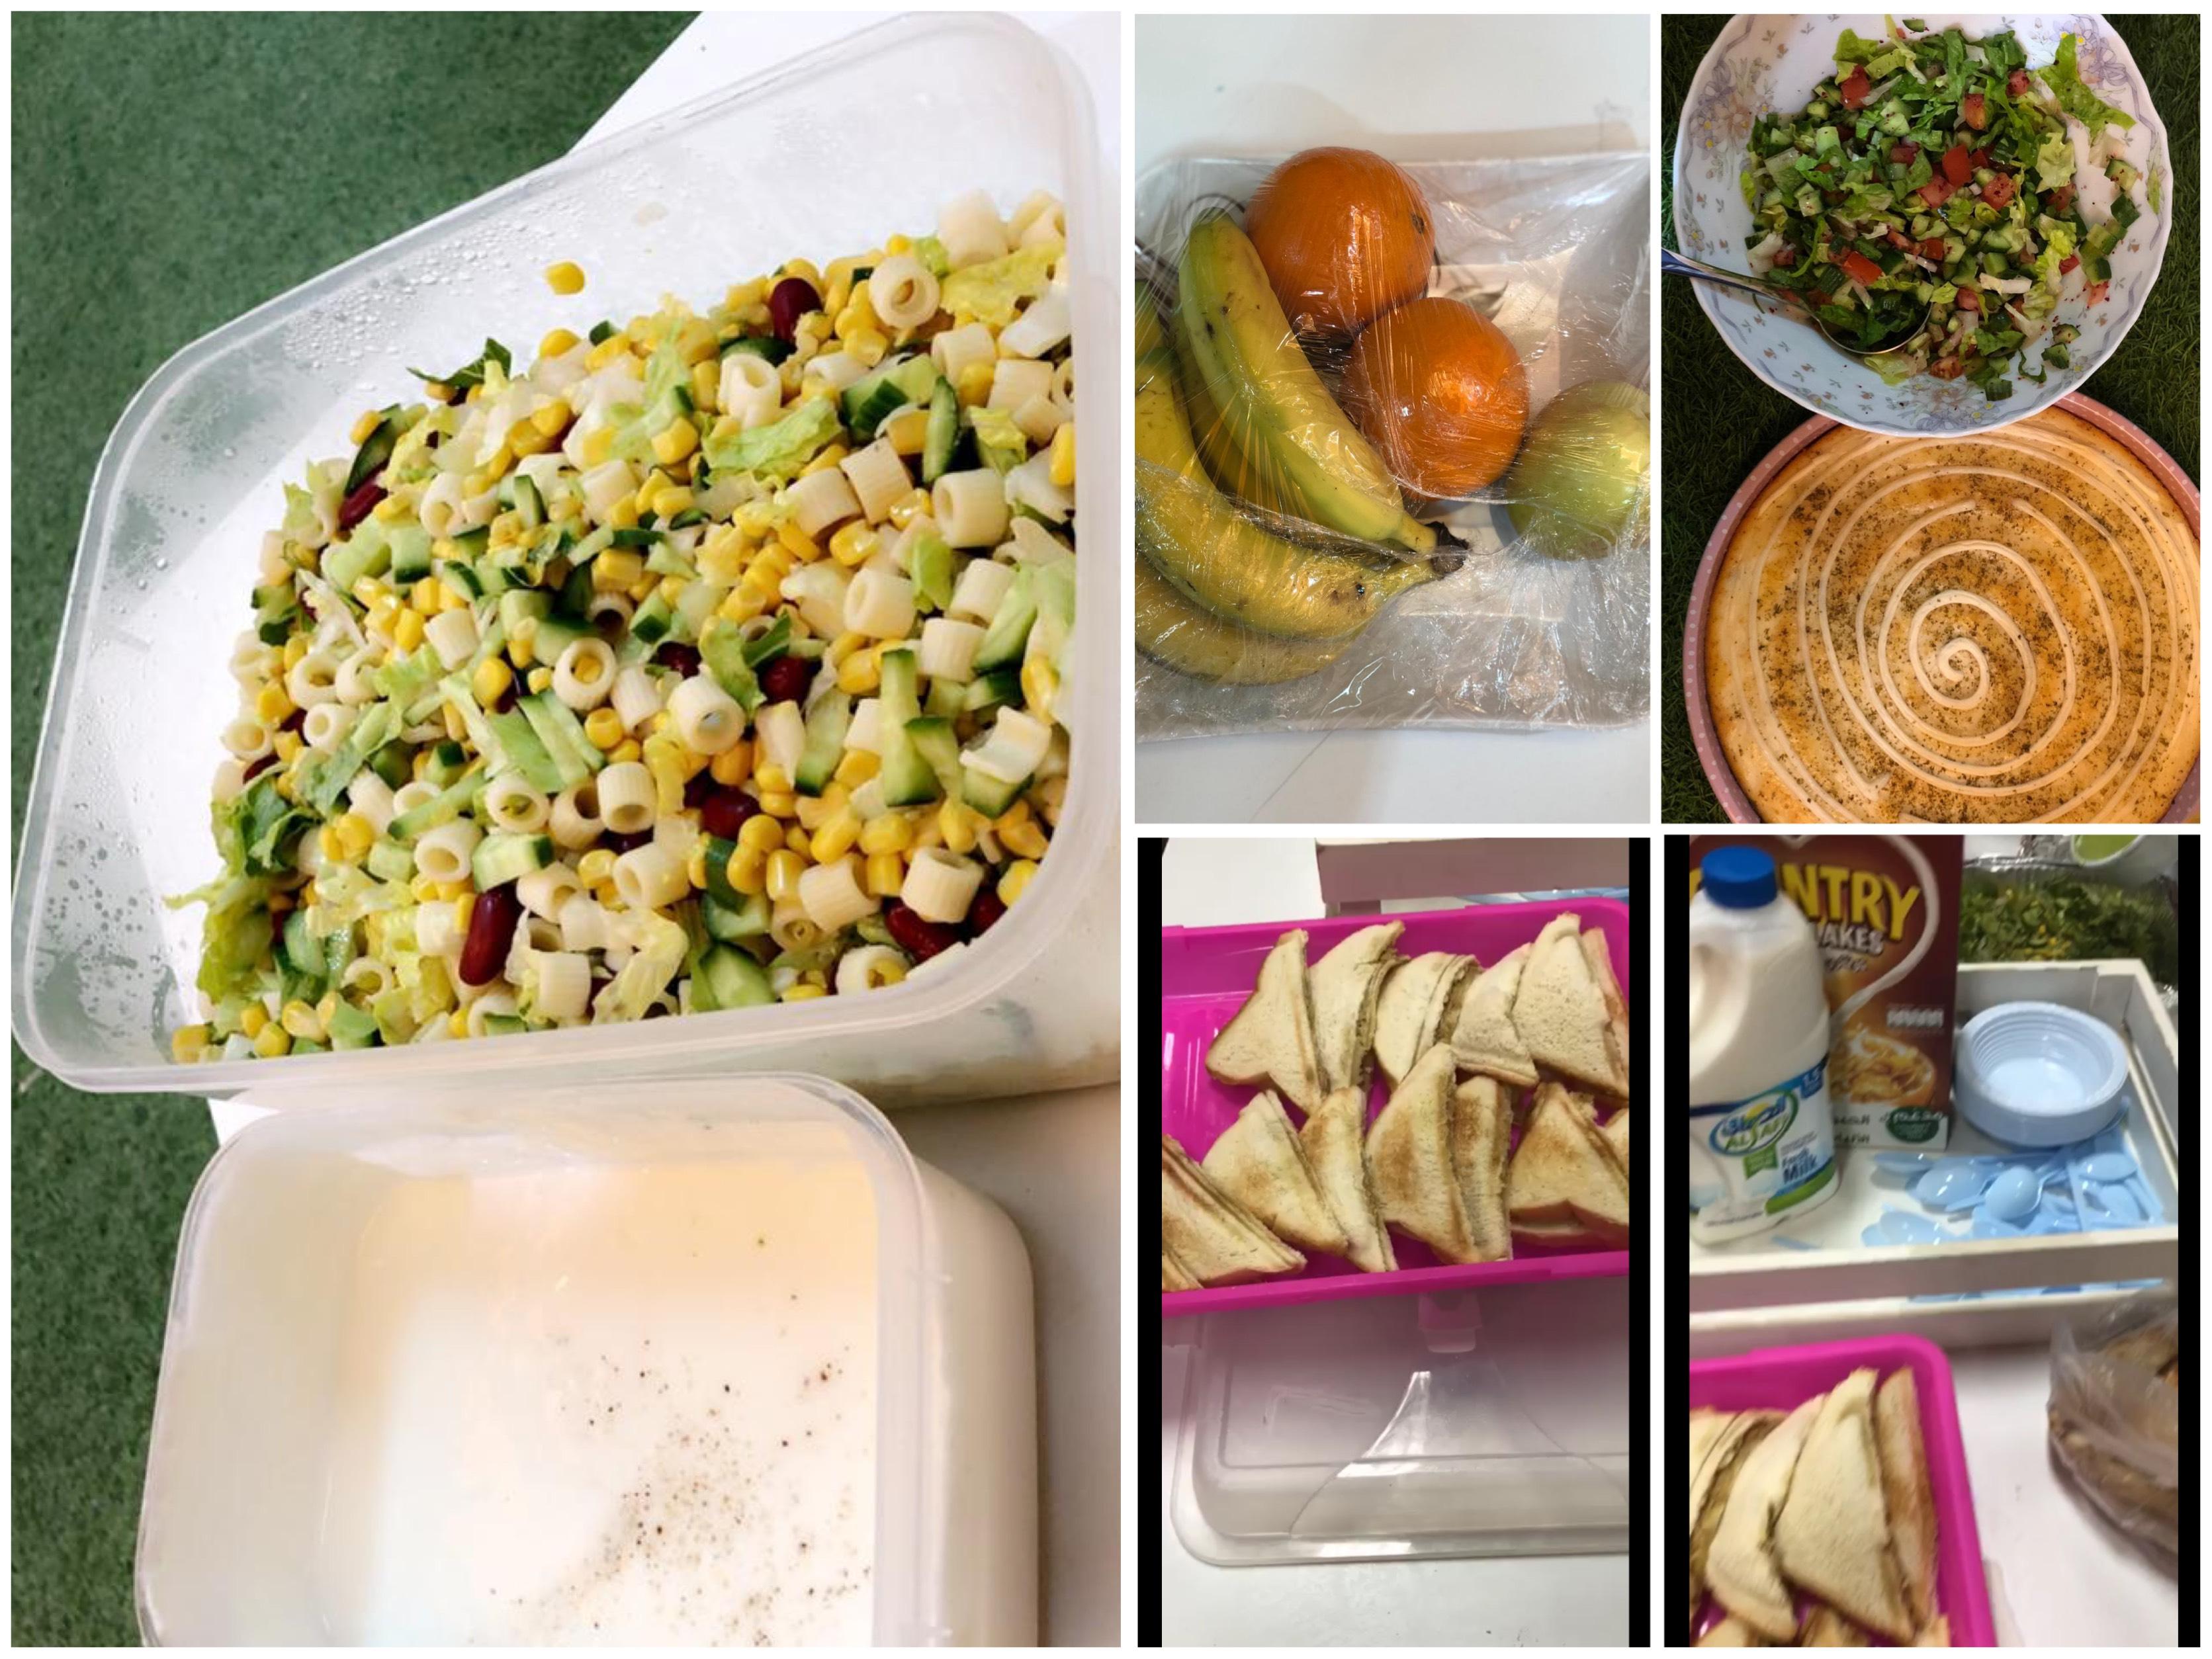 افطار صحي